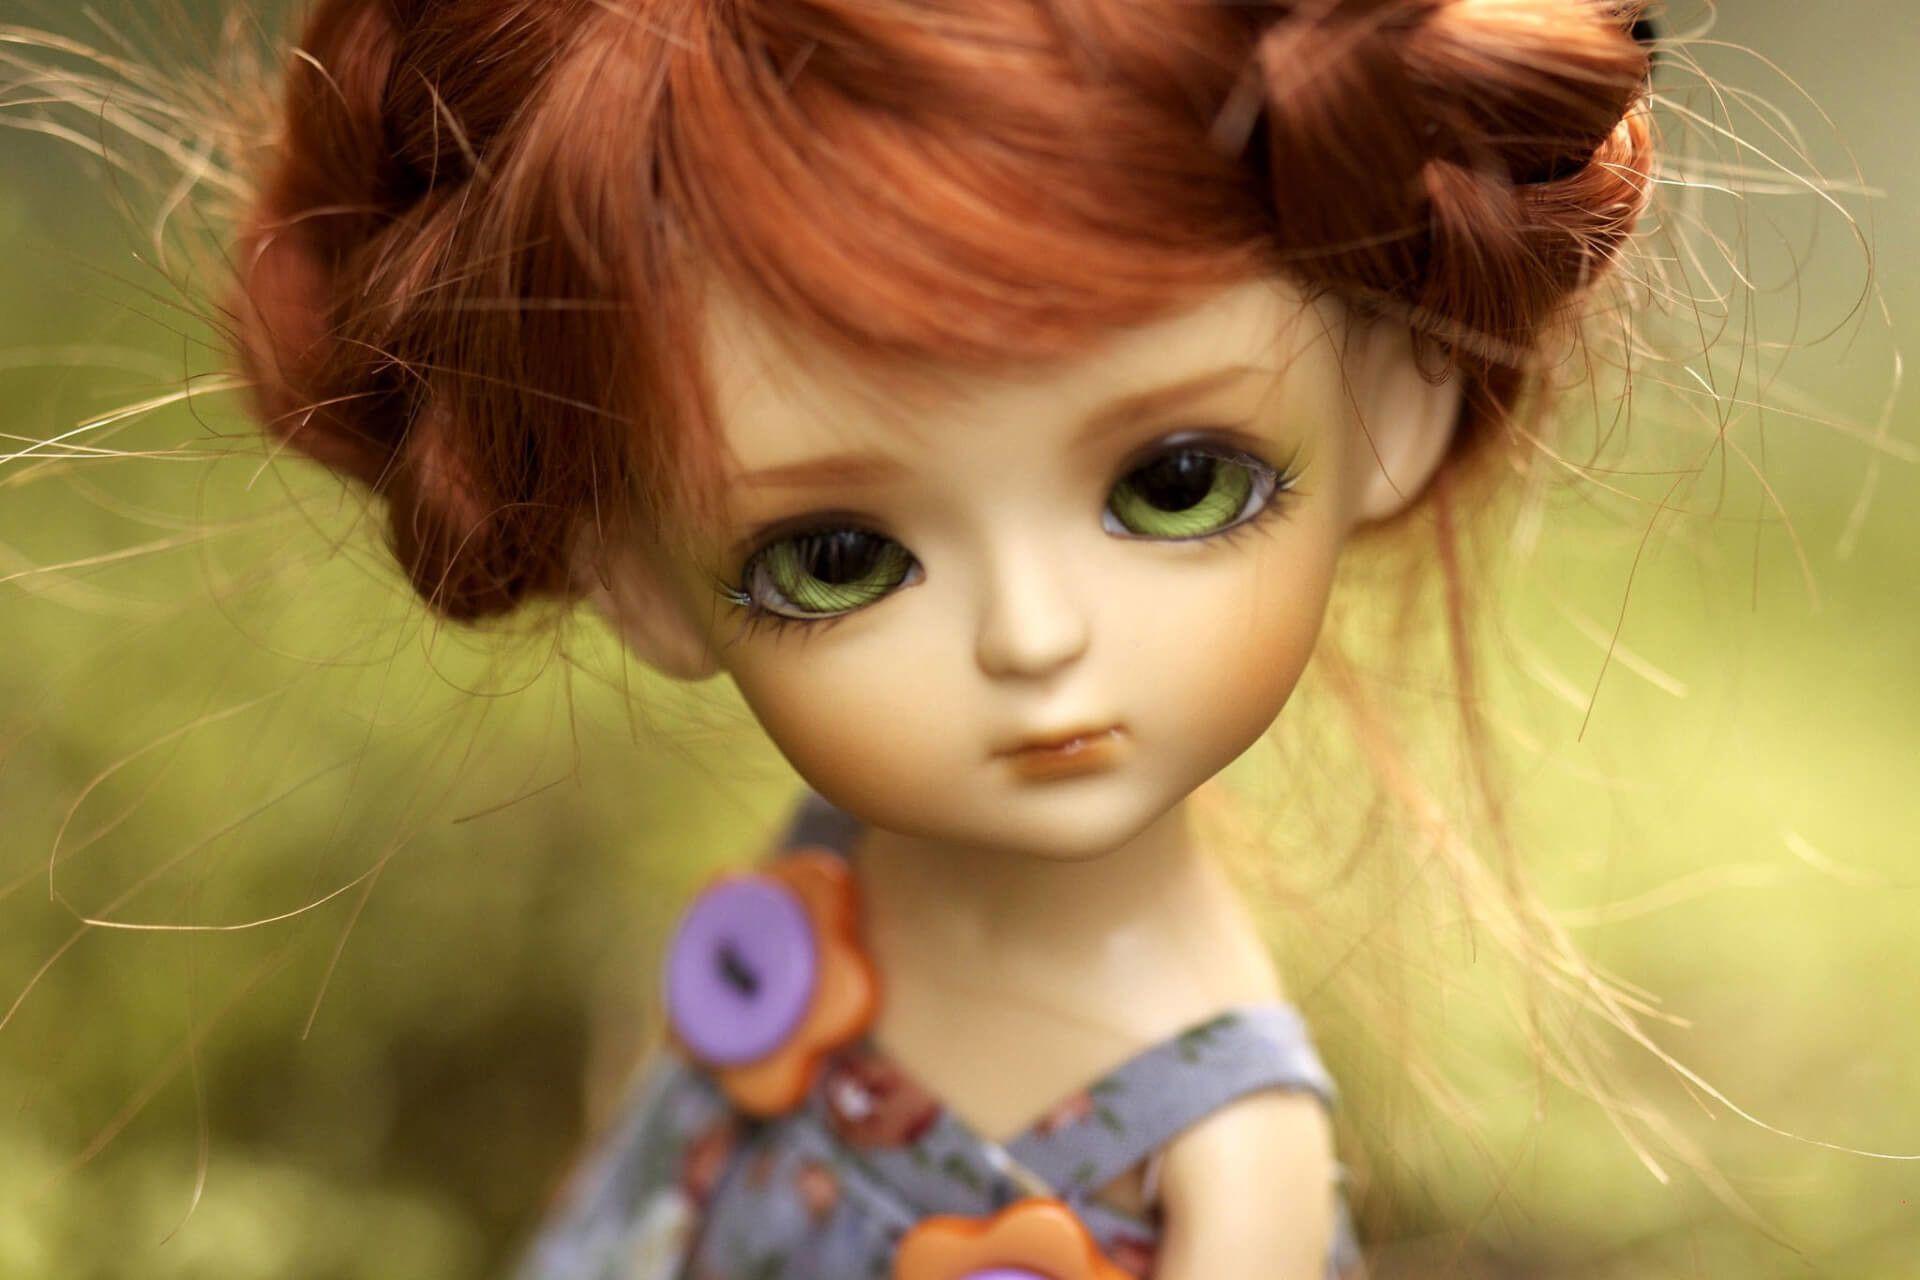 Cute Barbie Doll Photo Hd Barbie Dolls Barbie Beautiful Barbie Dolls